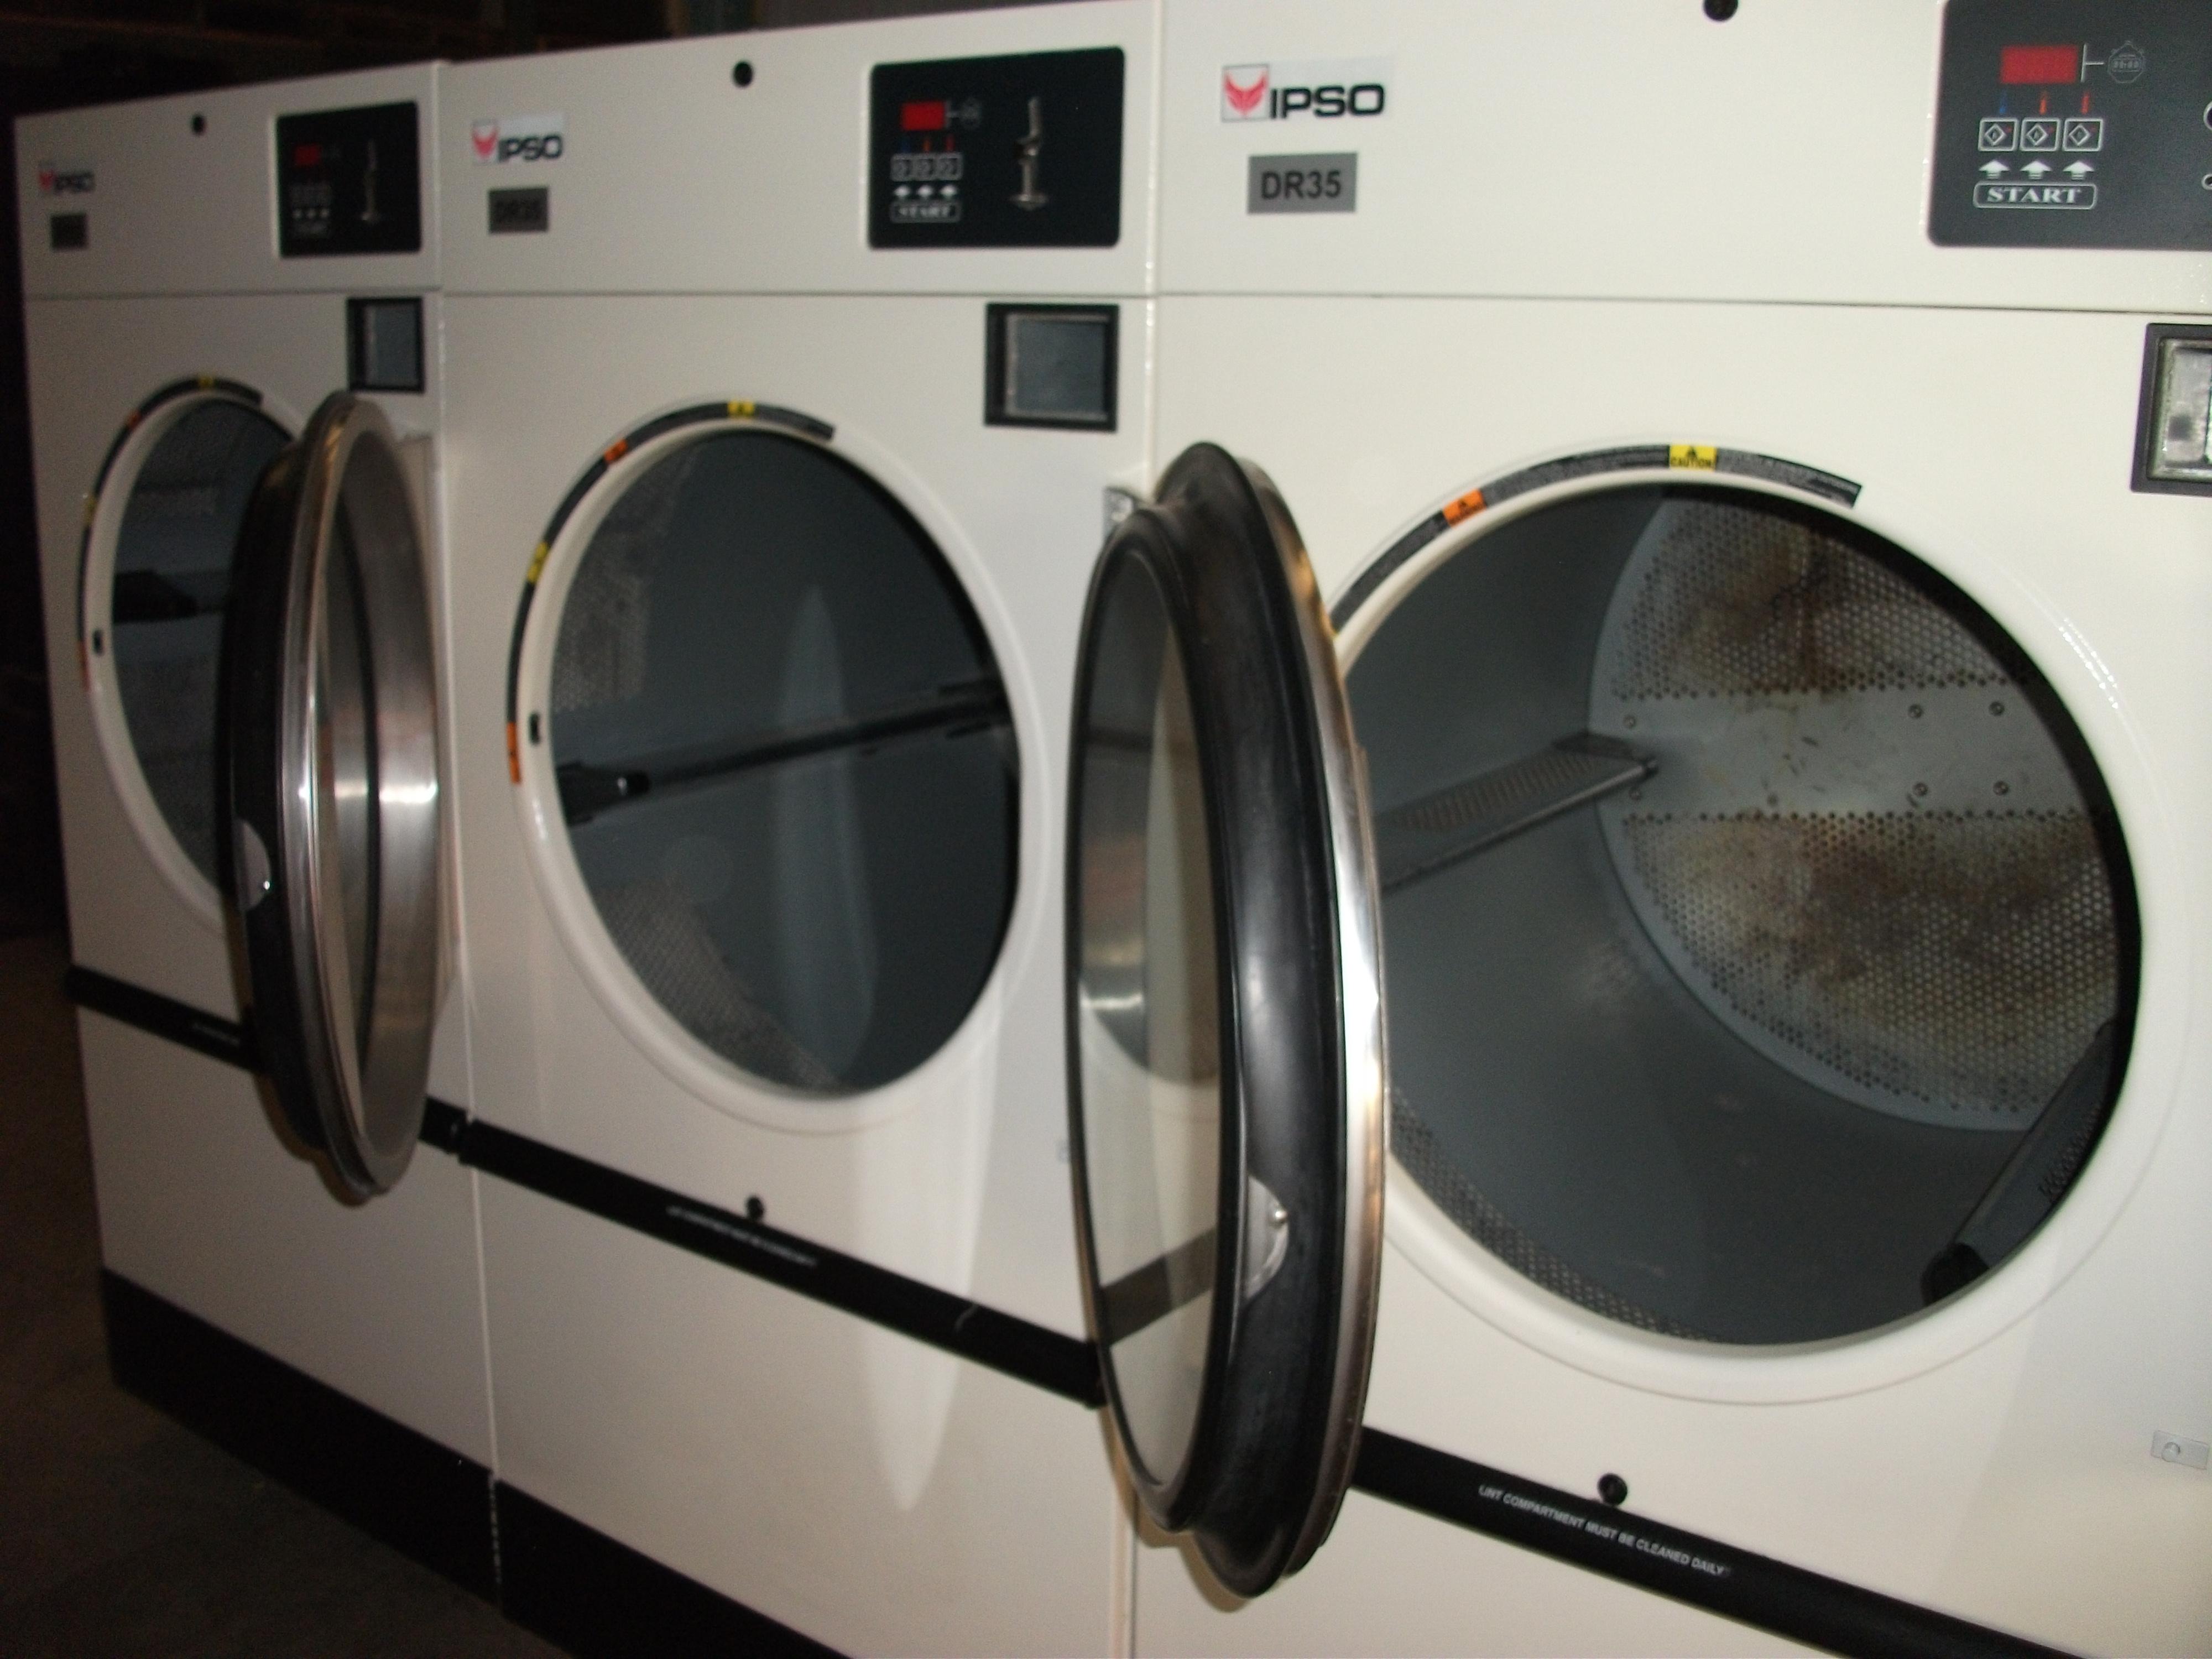 Ipso Dr35 35lbs Dryer